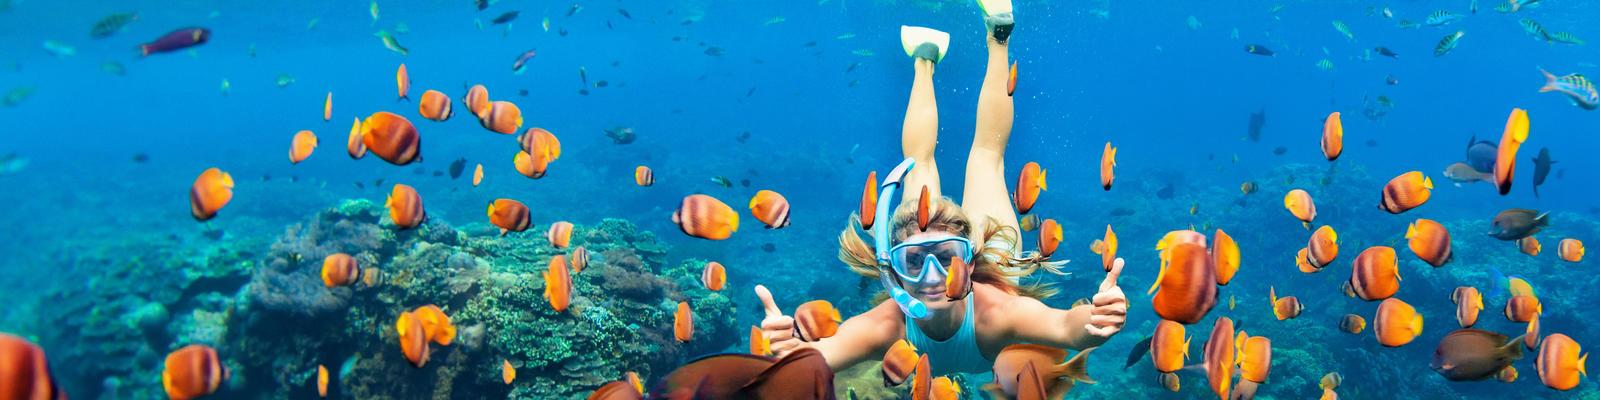 Snorkeling (Photo: Tropical studio/Shutterstock)